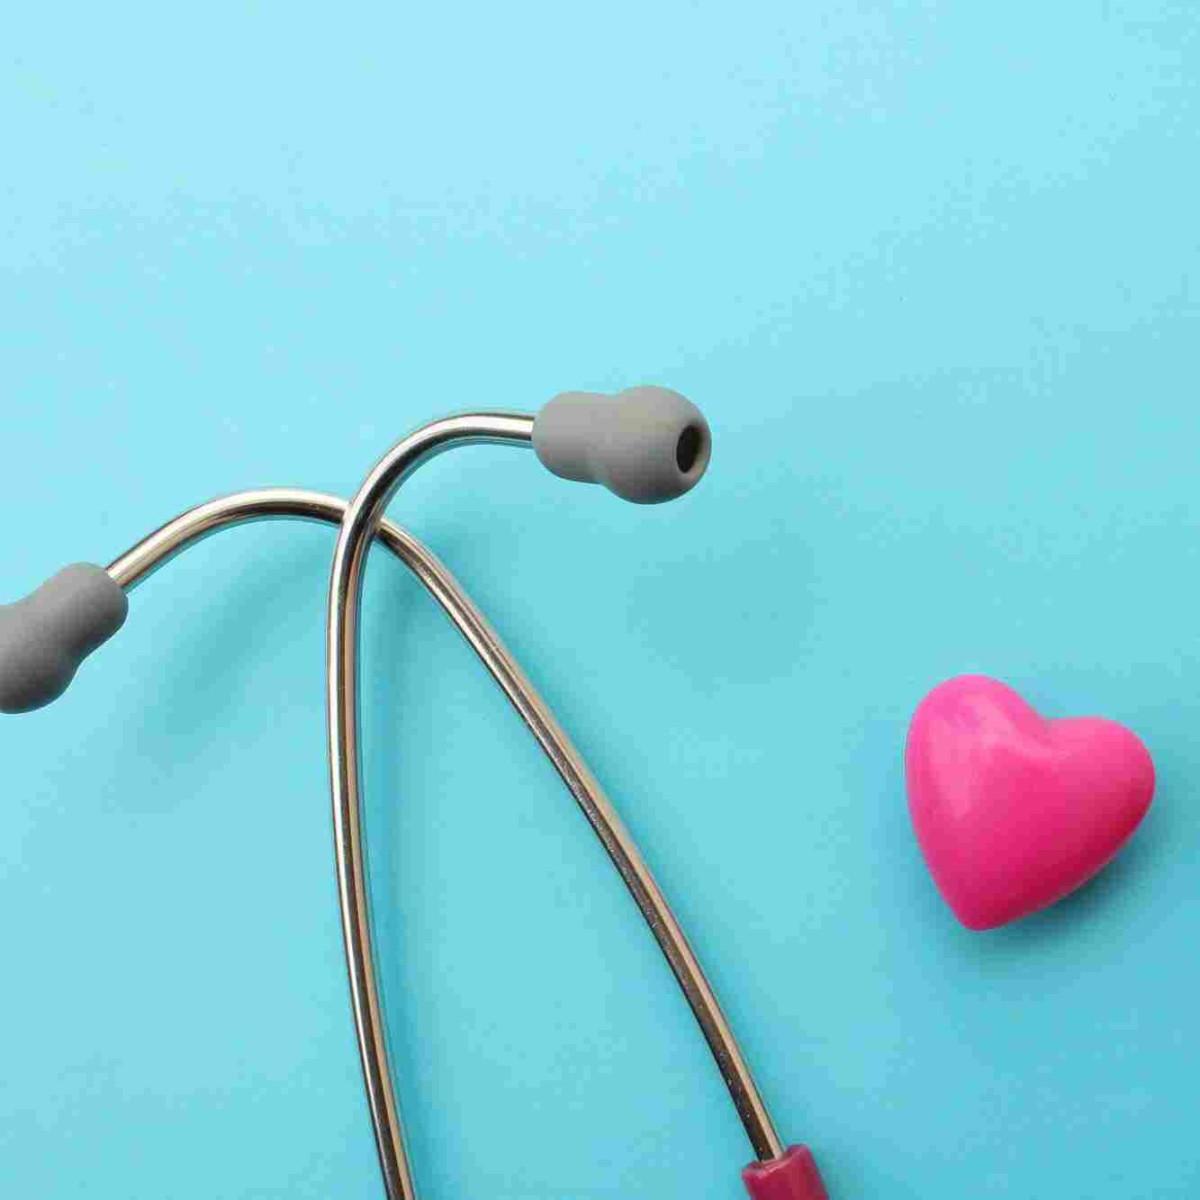 https://spencerhodges.co.uk/wp-content/uploads/2015/12/srce-i-stetoskop-1200x1200.jpg